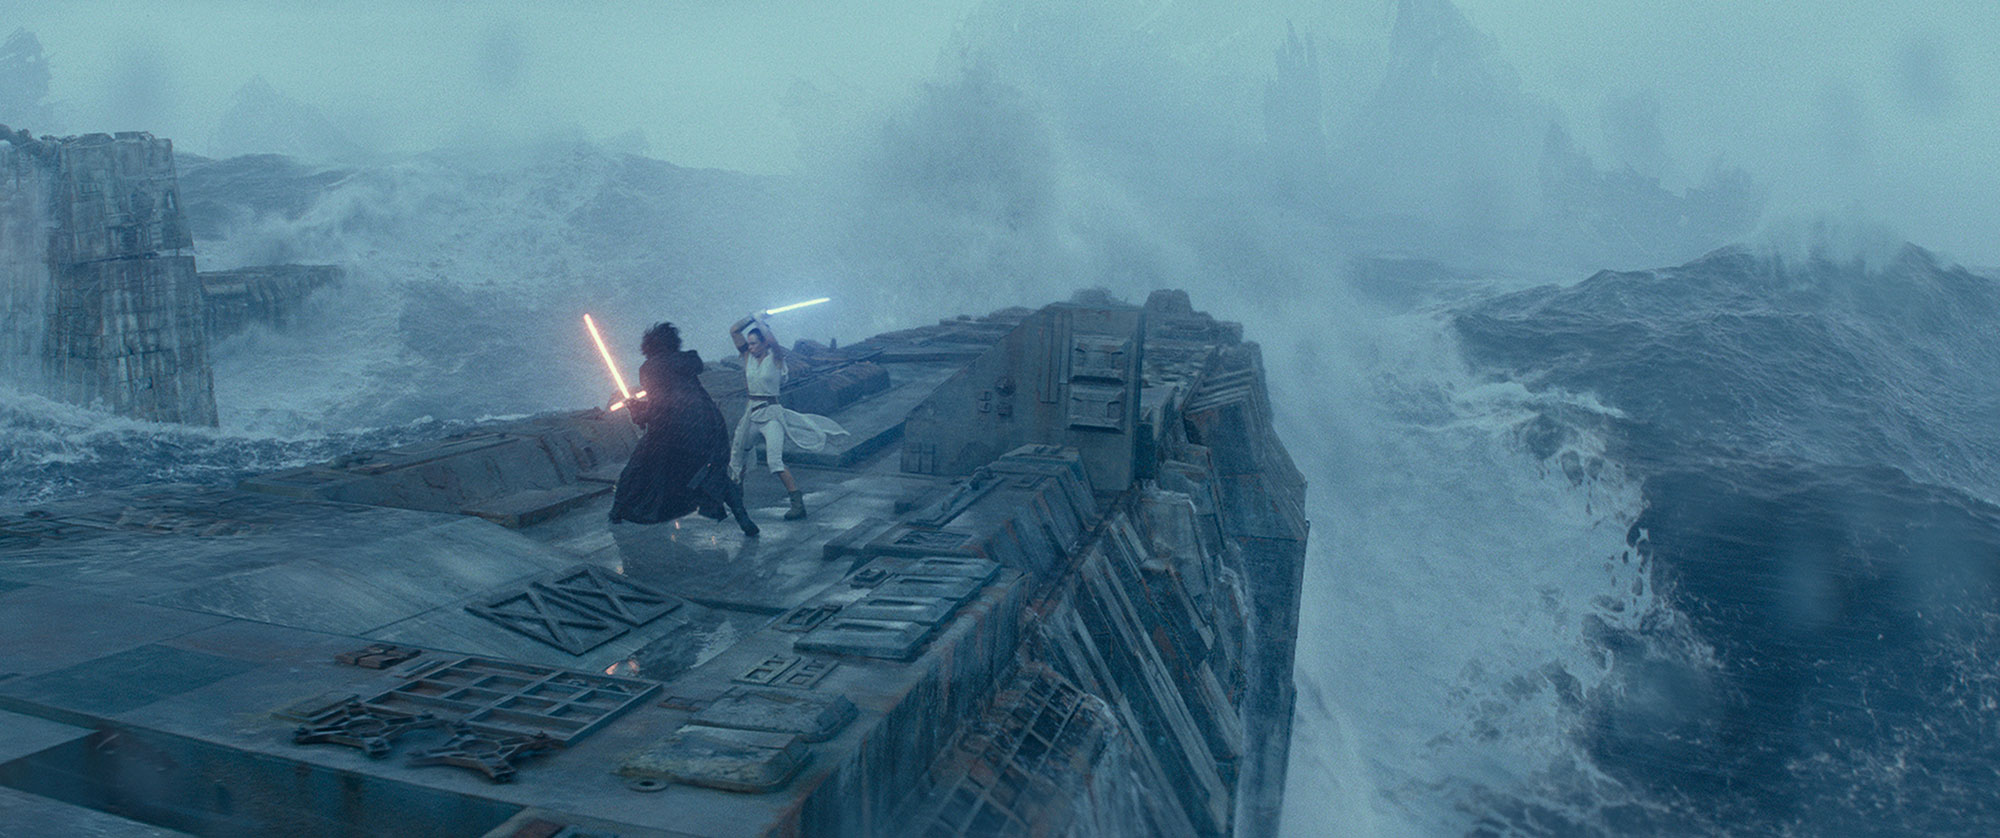 Noje_191206_Star-Wars_